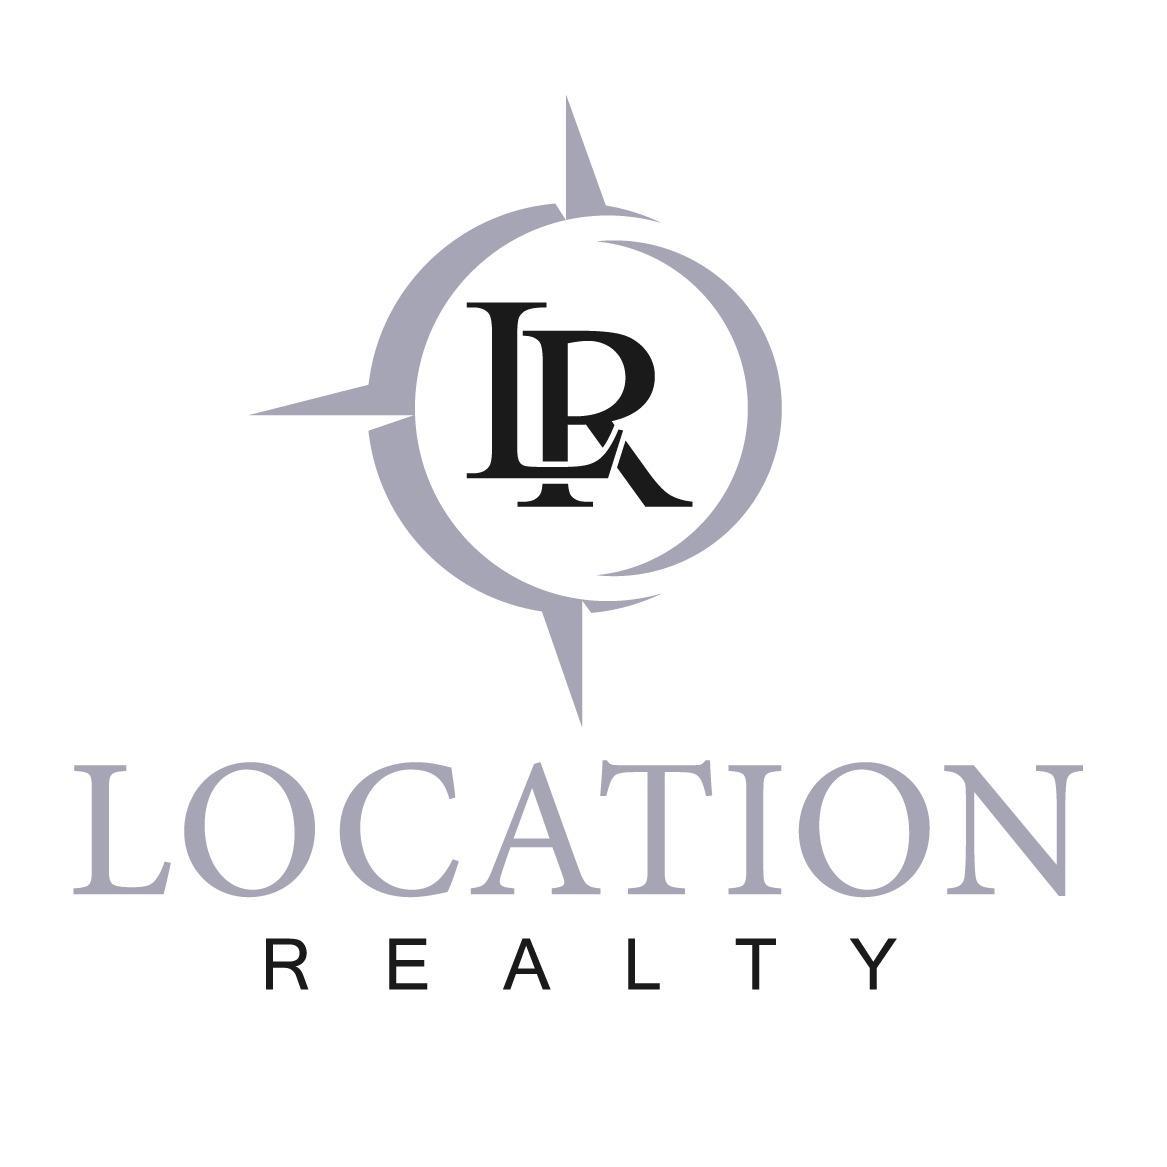 Location Reality LLC image 1